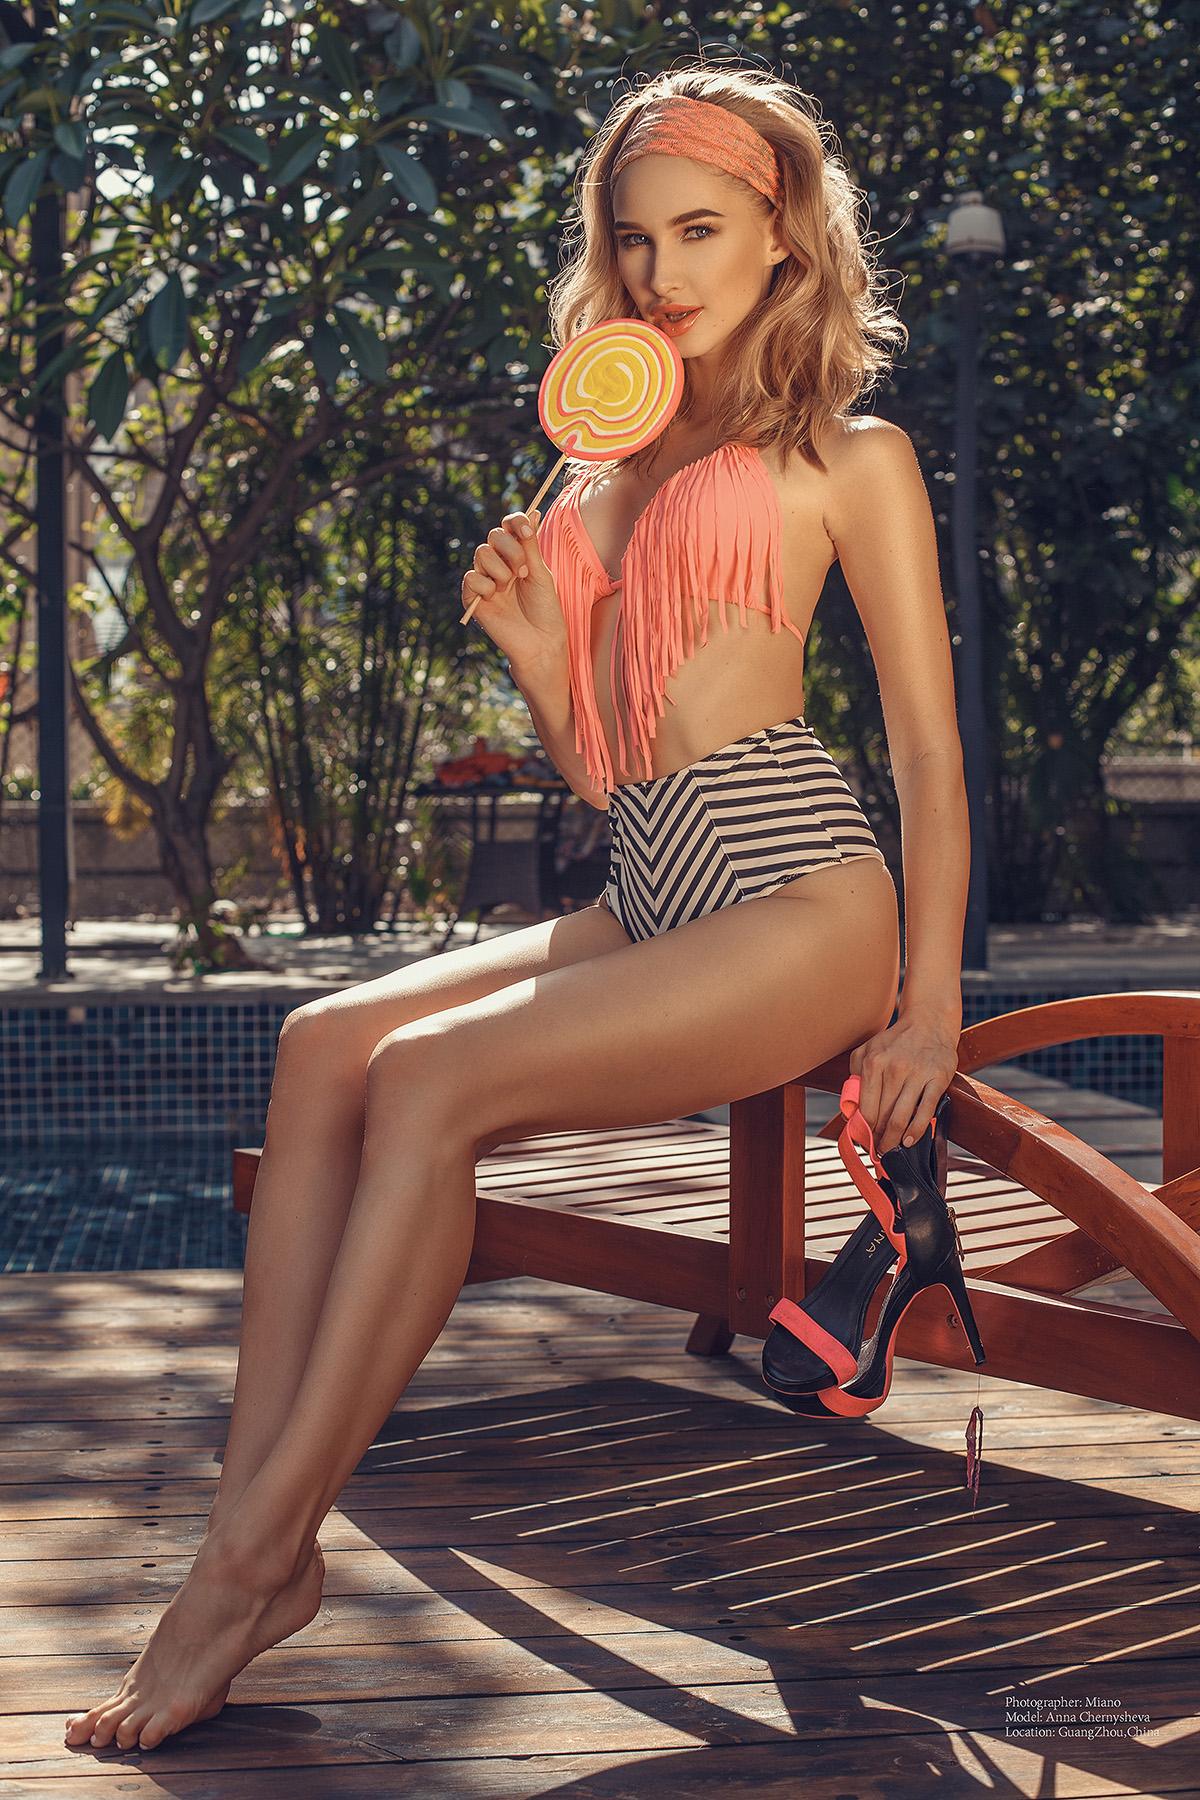 Анна Чернышева в бассейне / фото Miano